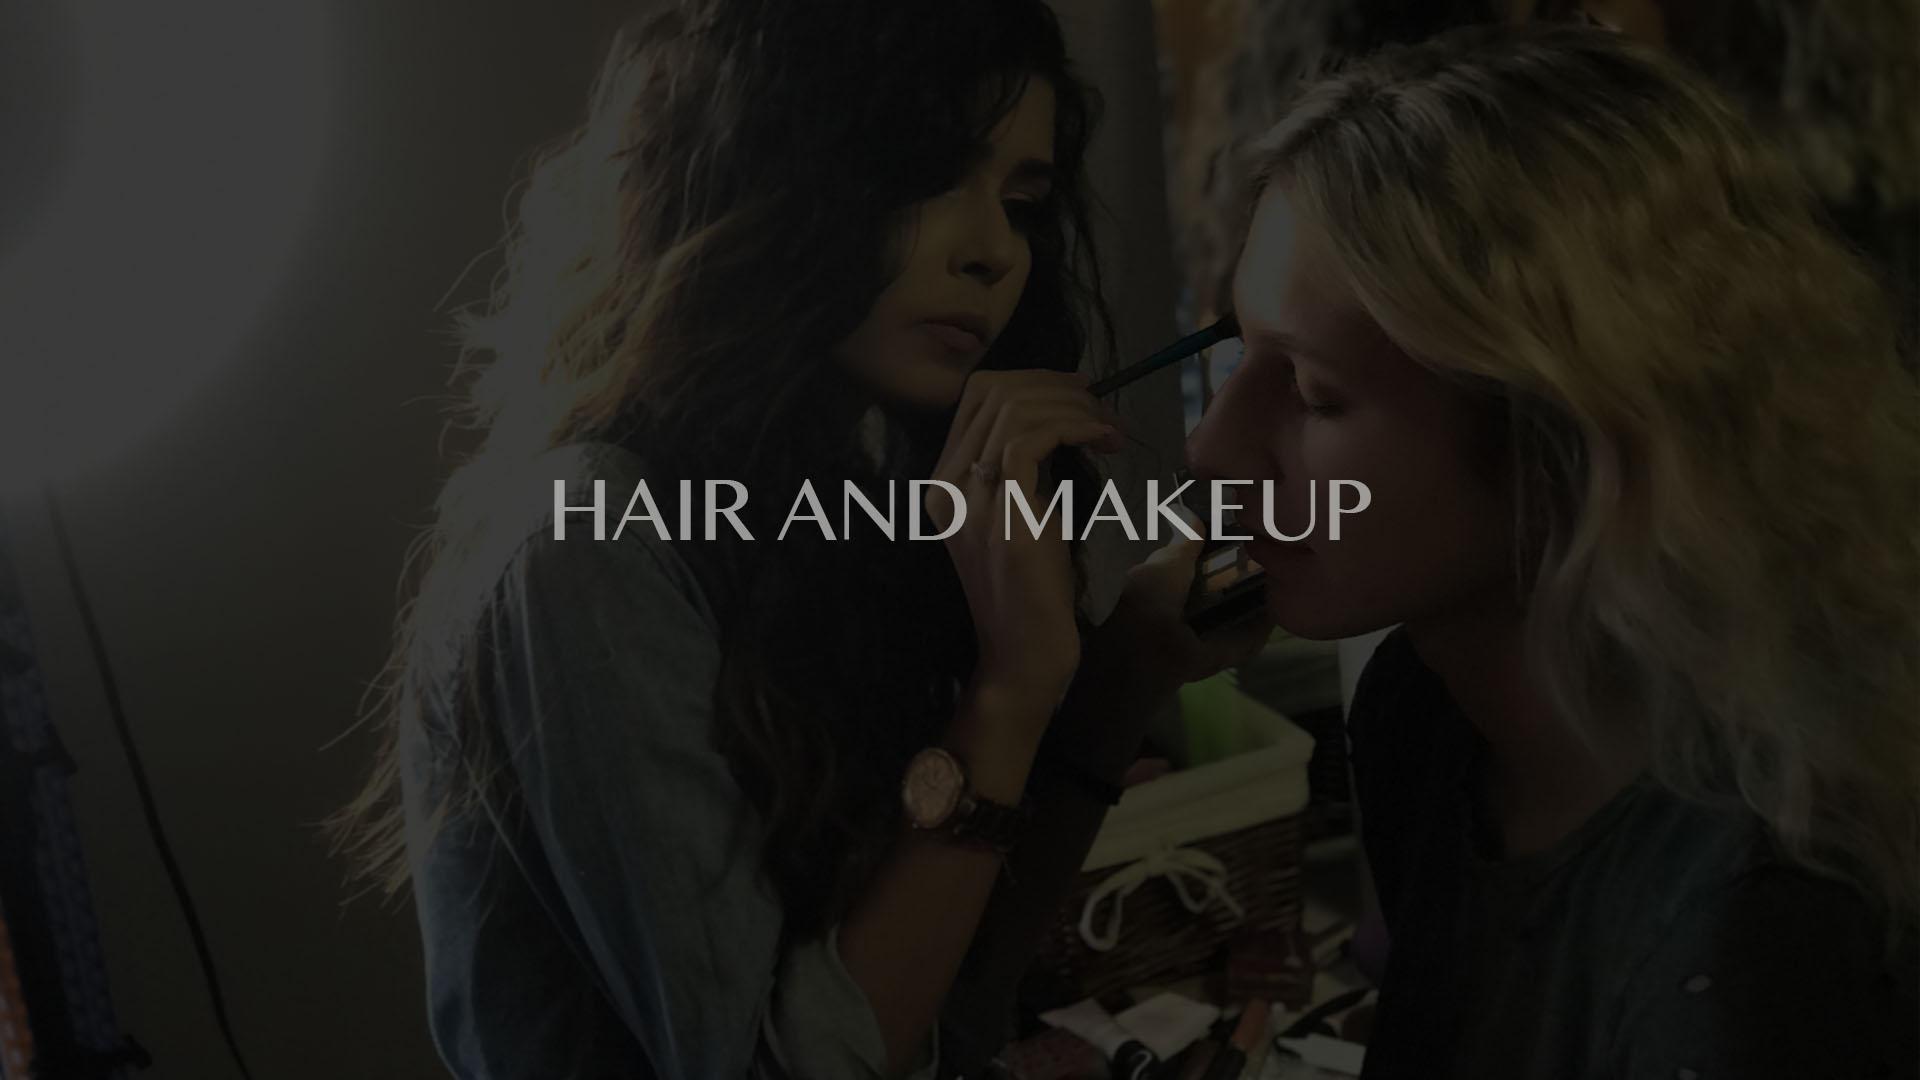 Hair and makeup.jpg